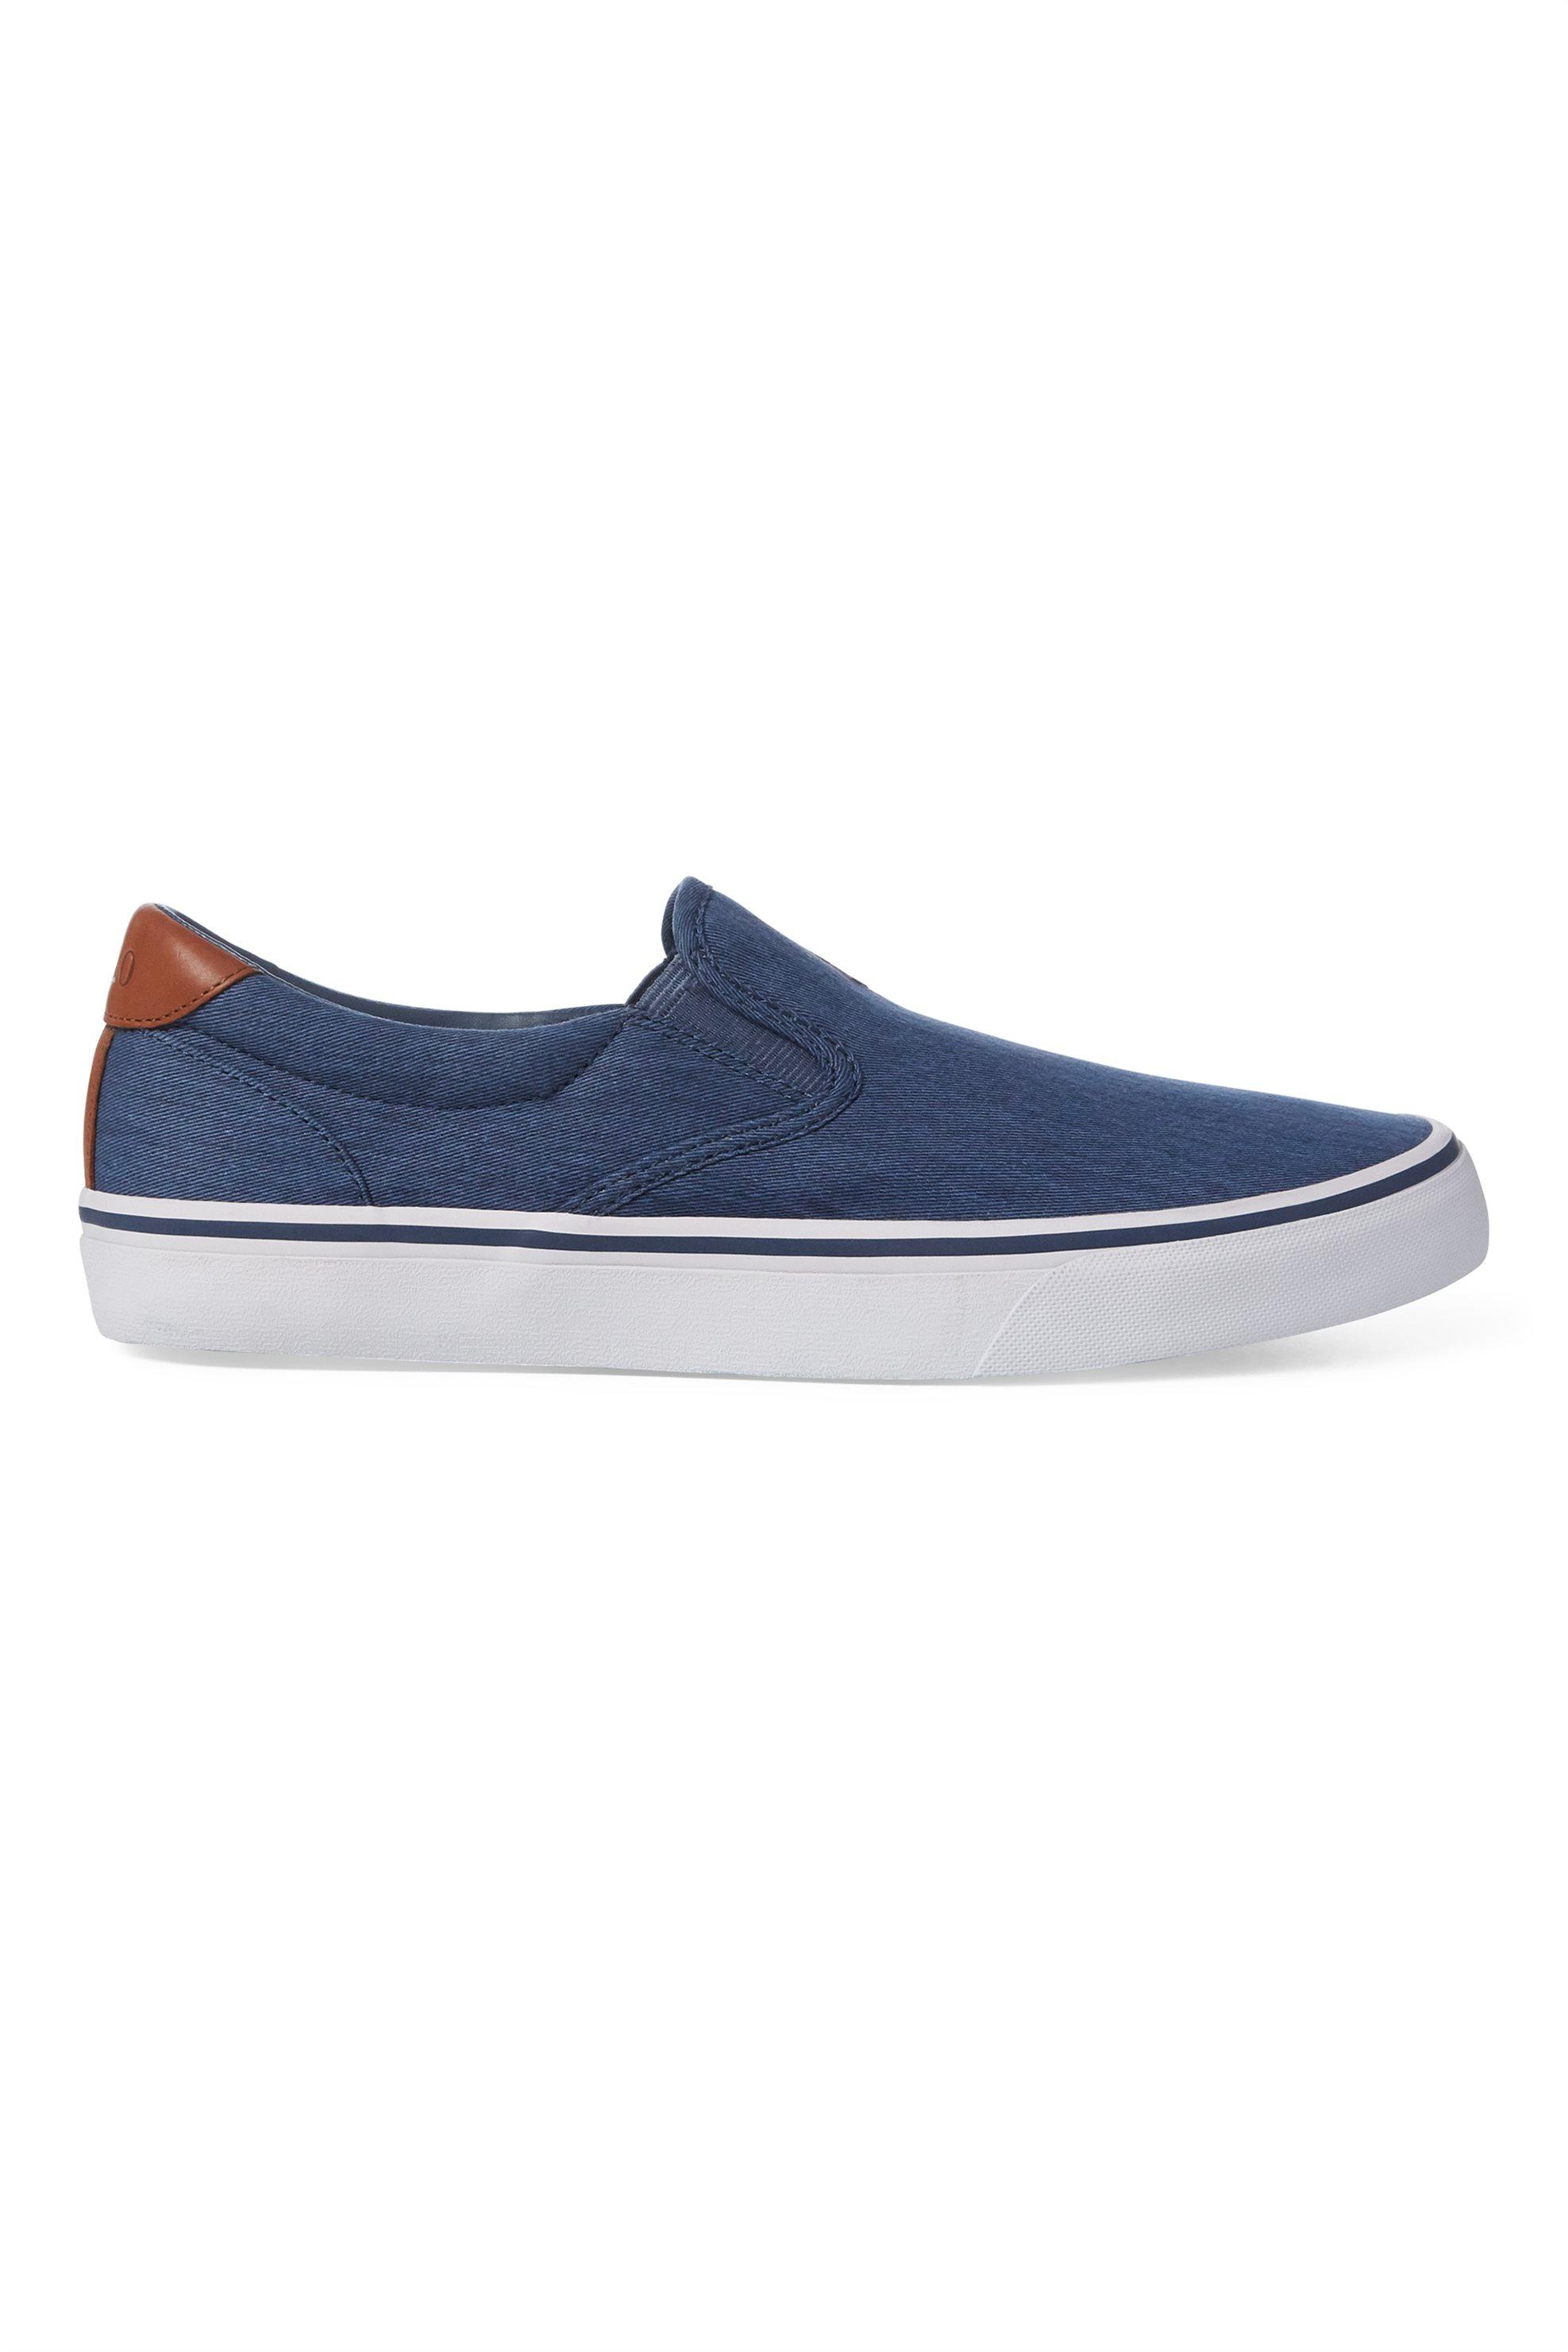 Polo Ralph Lauren ανδρικά sneakers slip-on μονόχρωμα